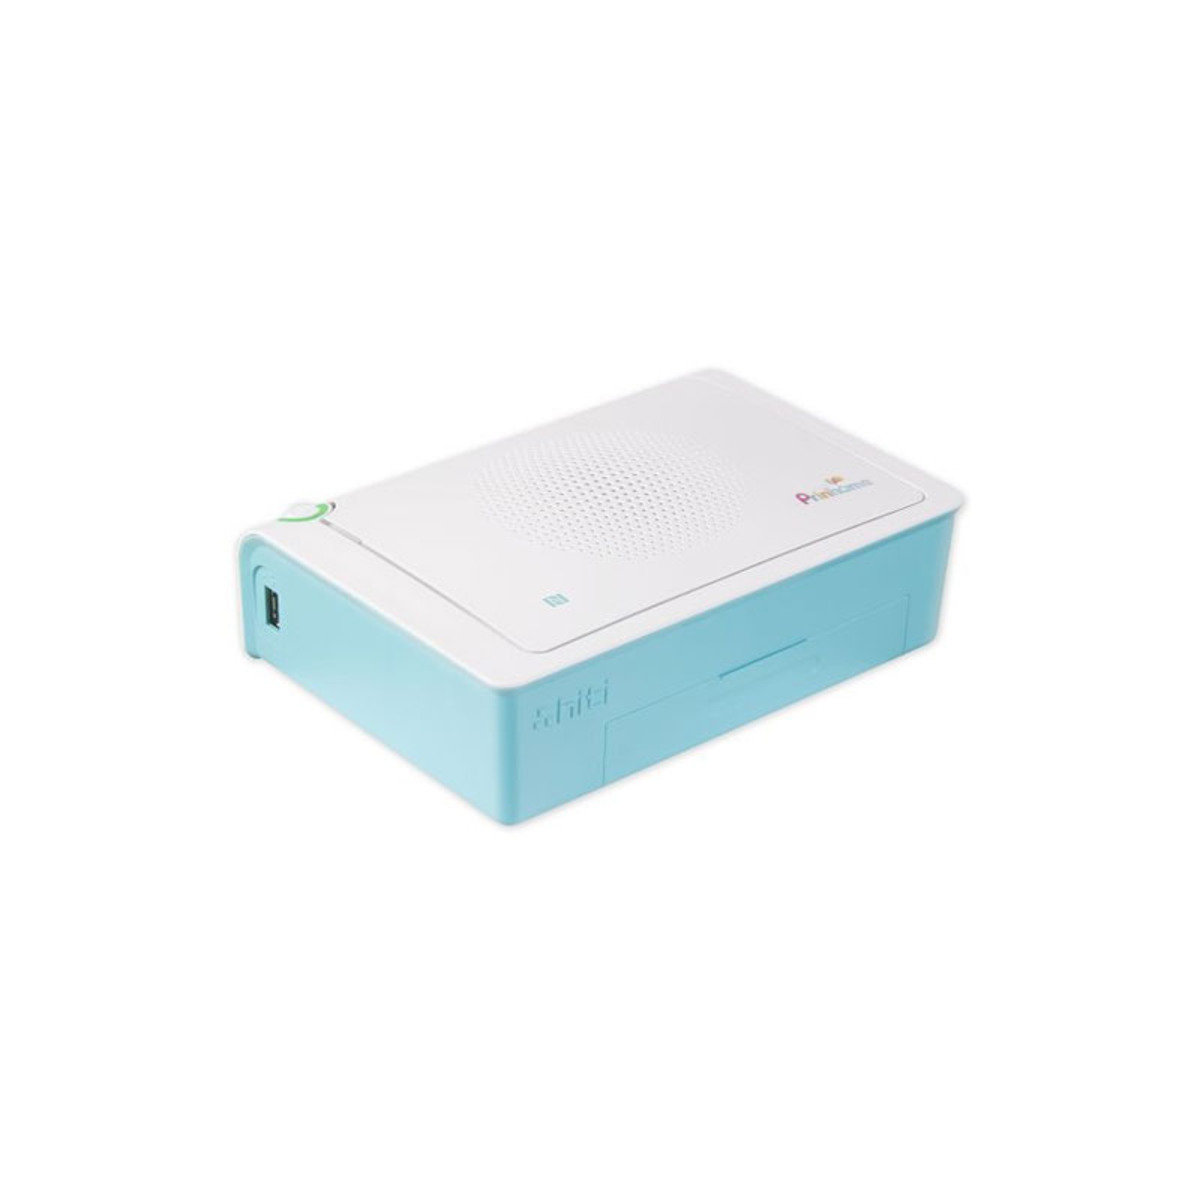 4R家用型熱昇華相片打印機 Prinhome White&Blue